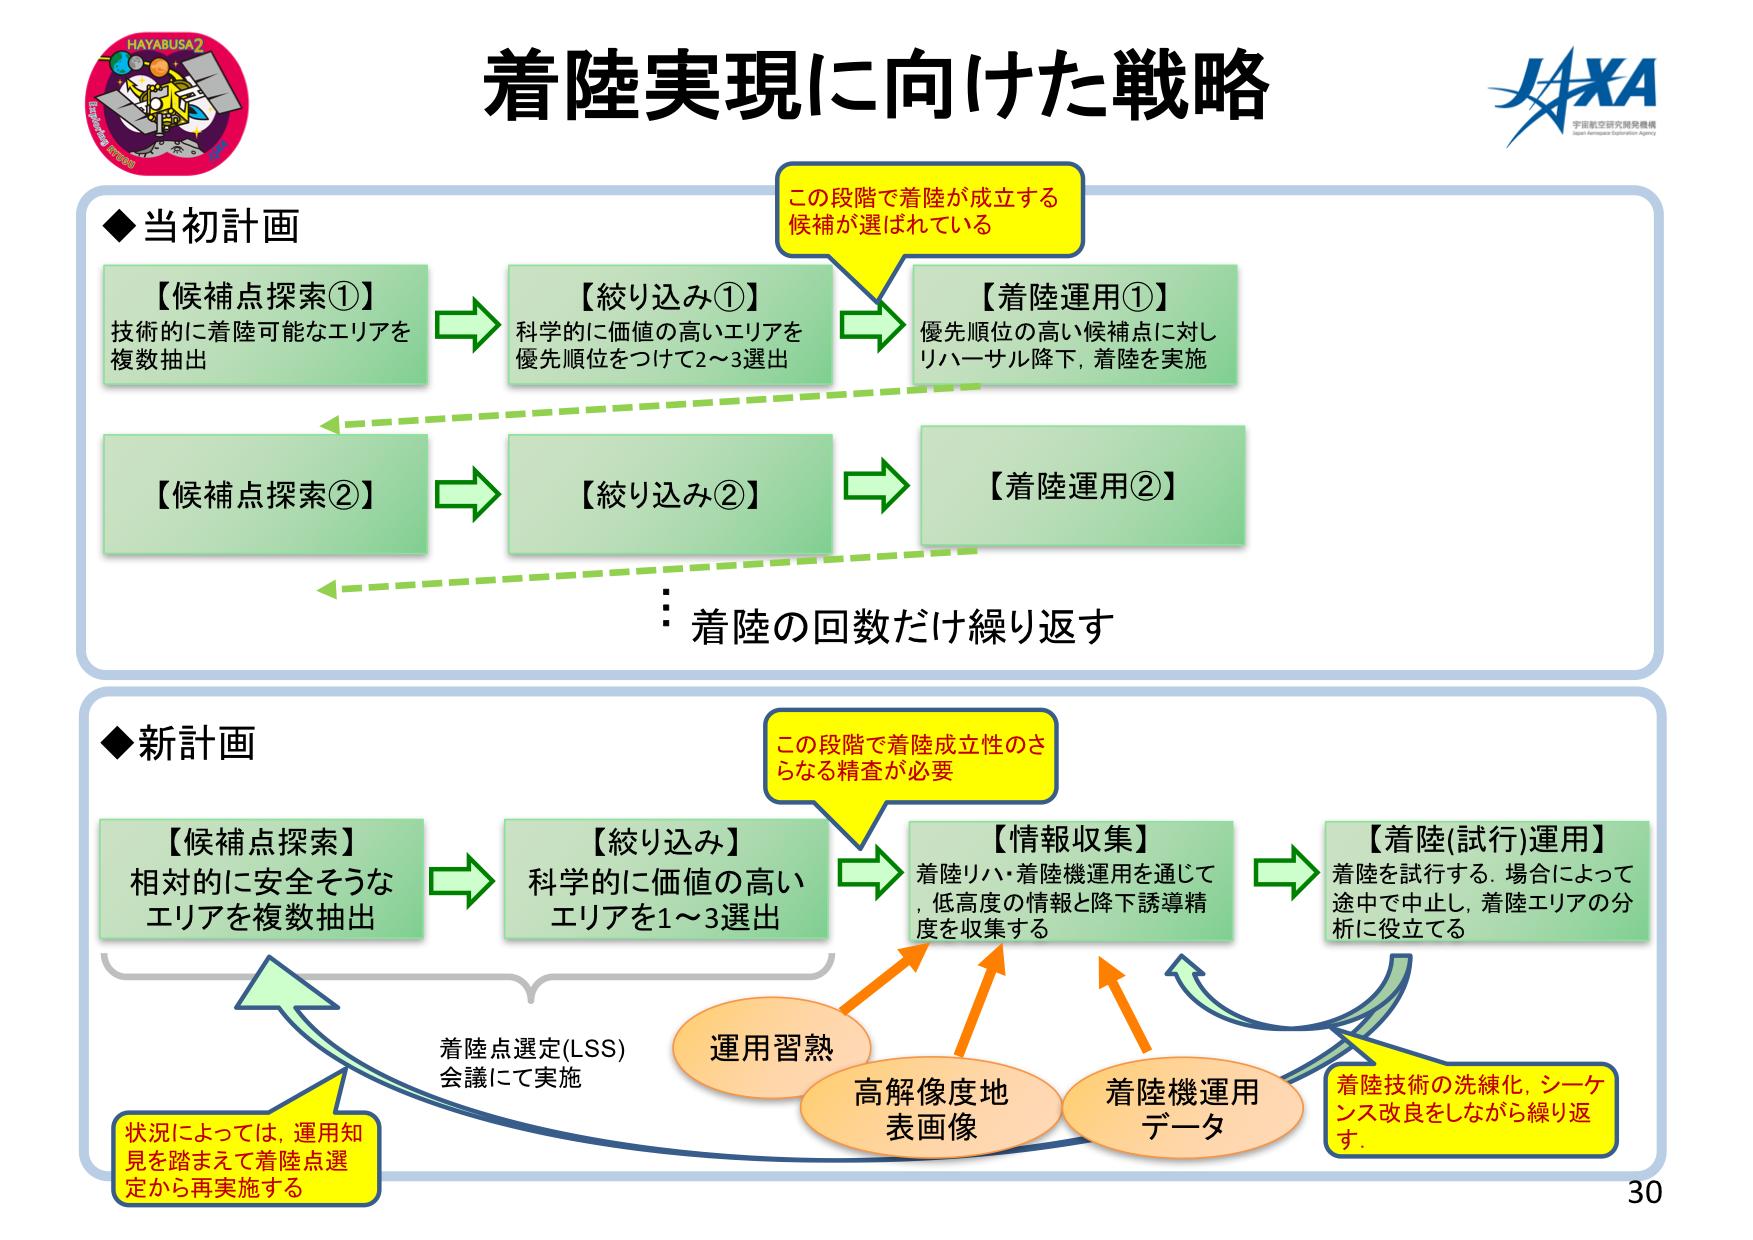 f:id:Imamura:20180905232002p:plain